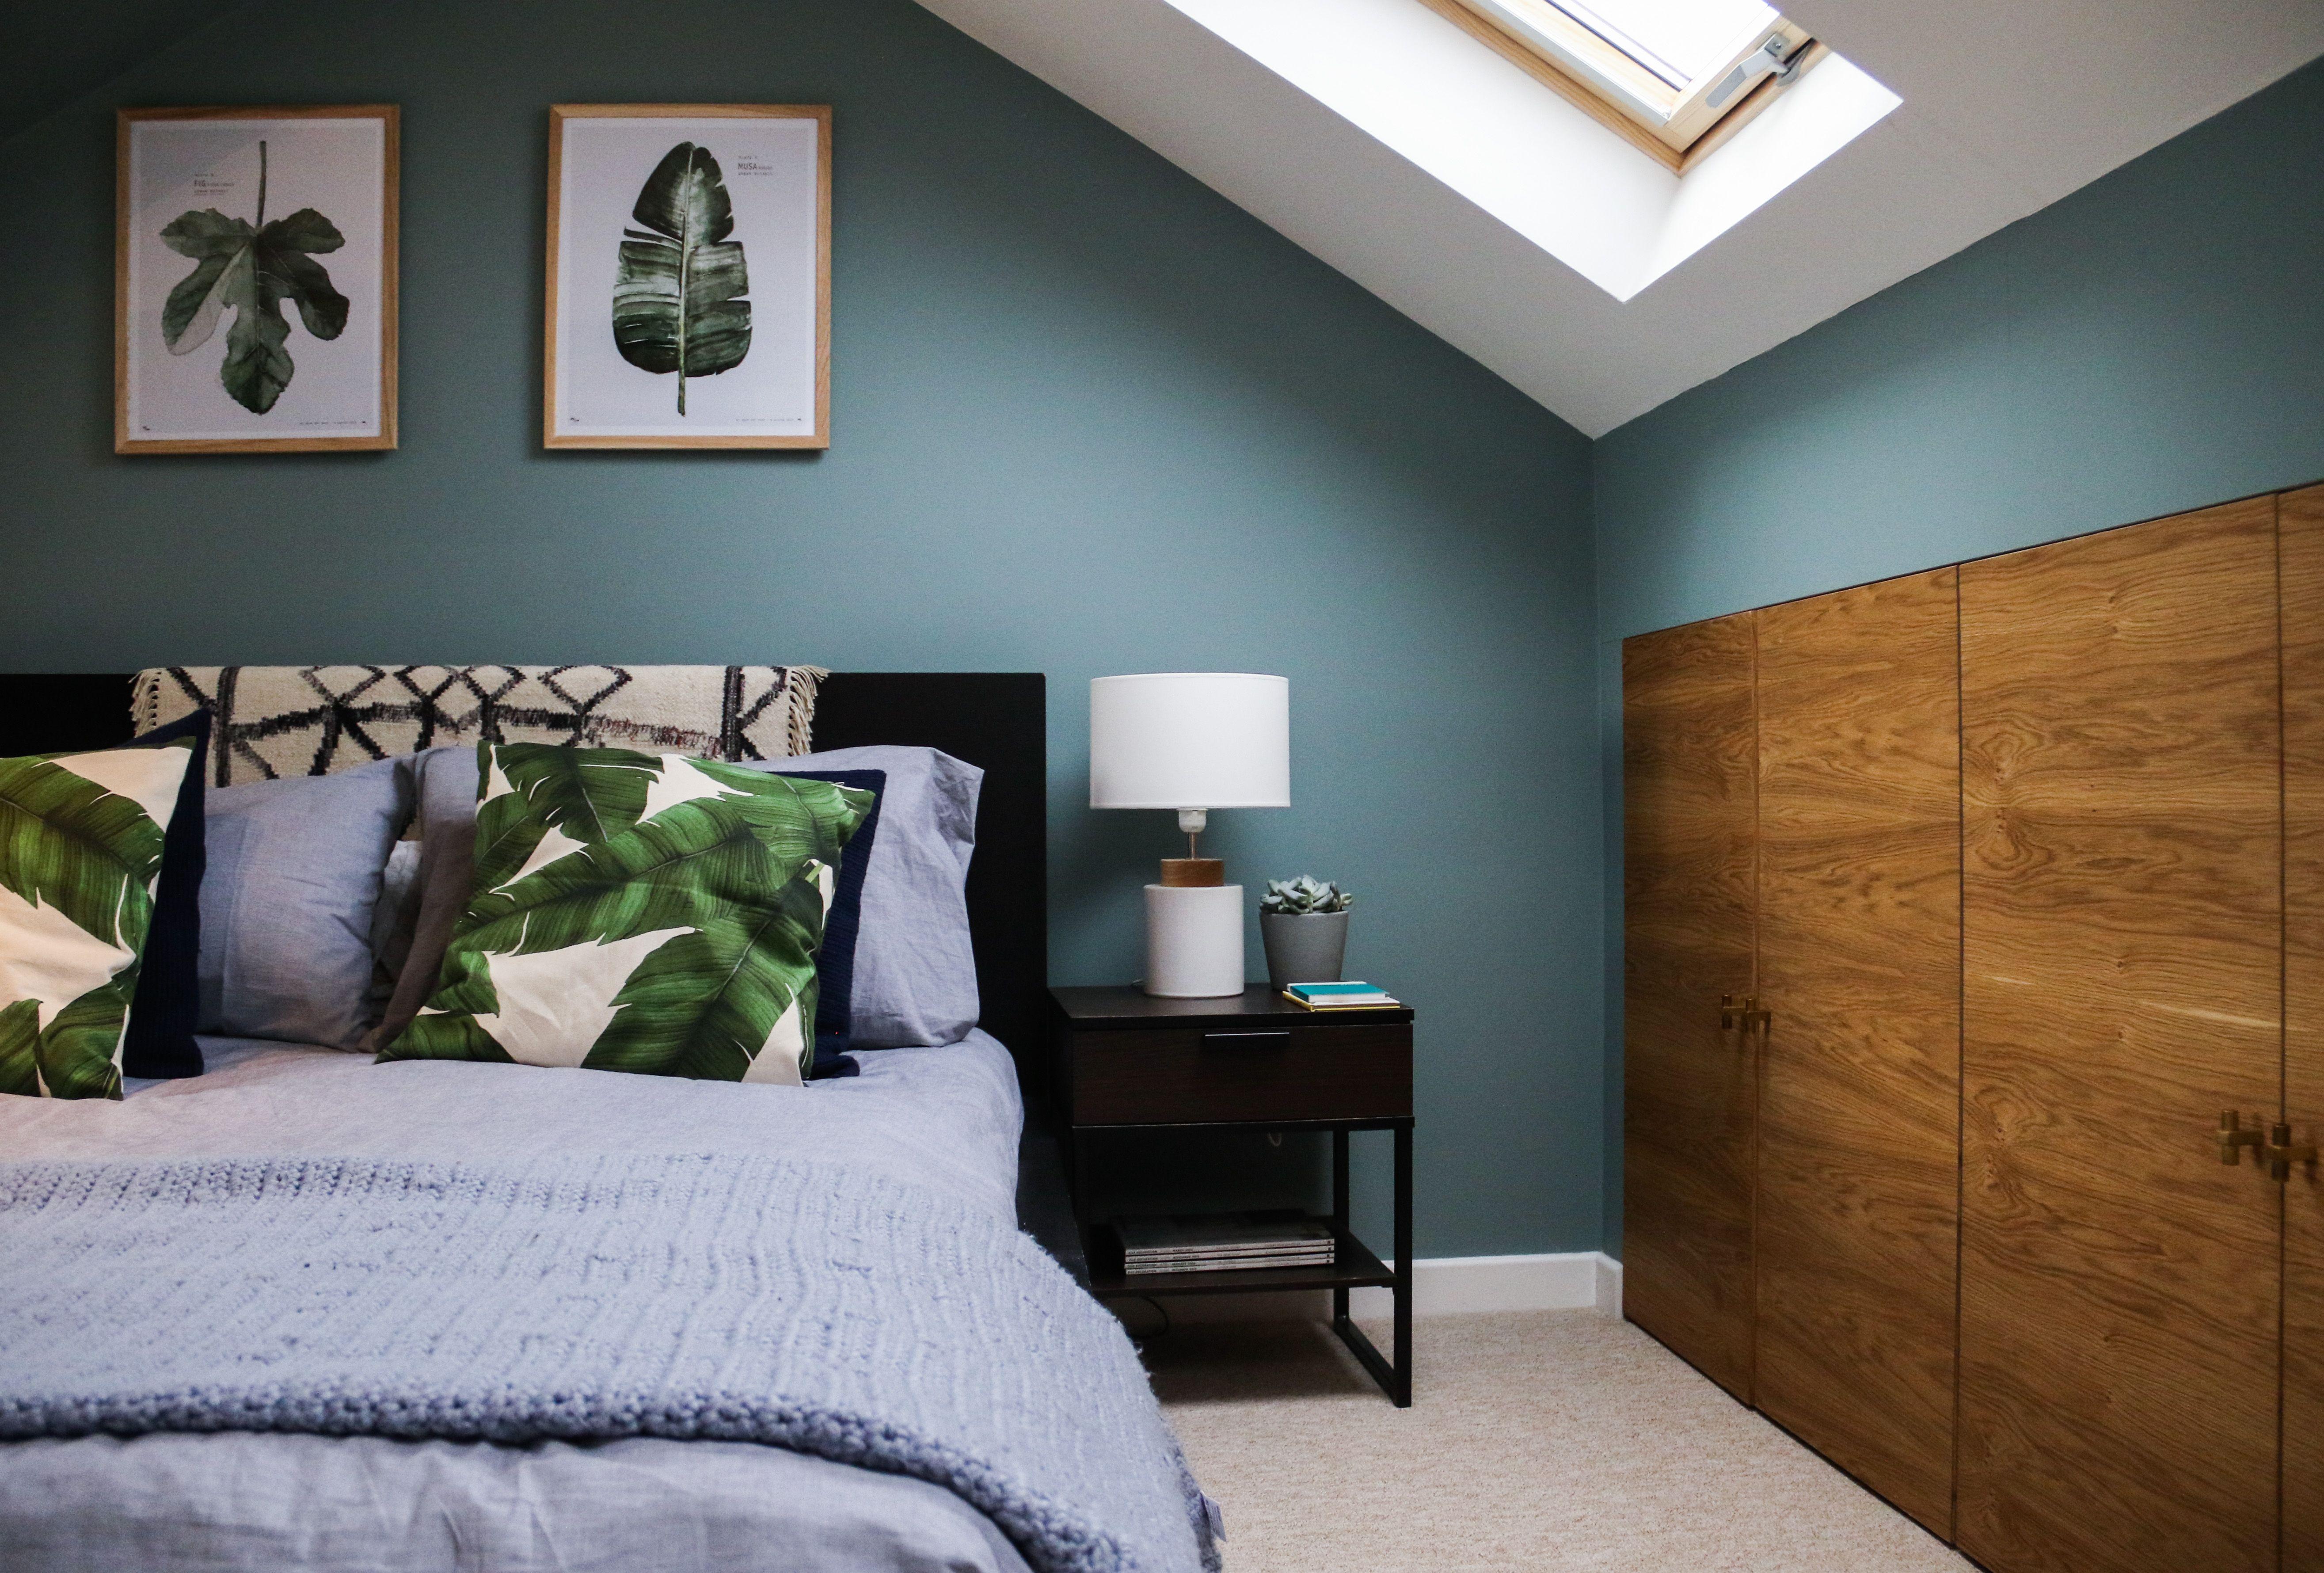 Farrow & Ball Oval Room Blue, Palm Leaves, Calming Loft